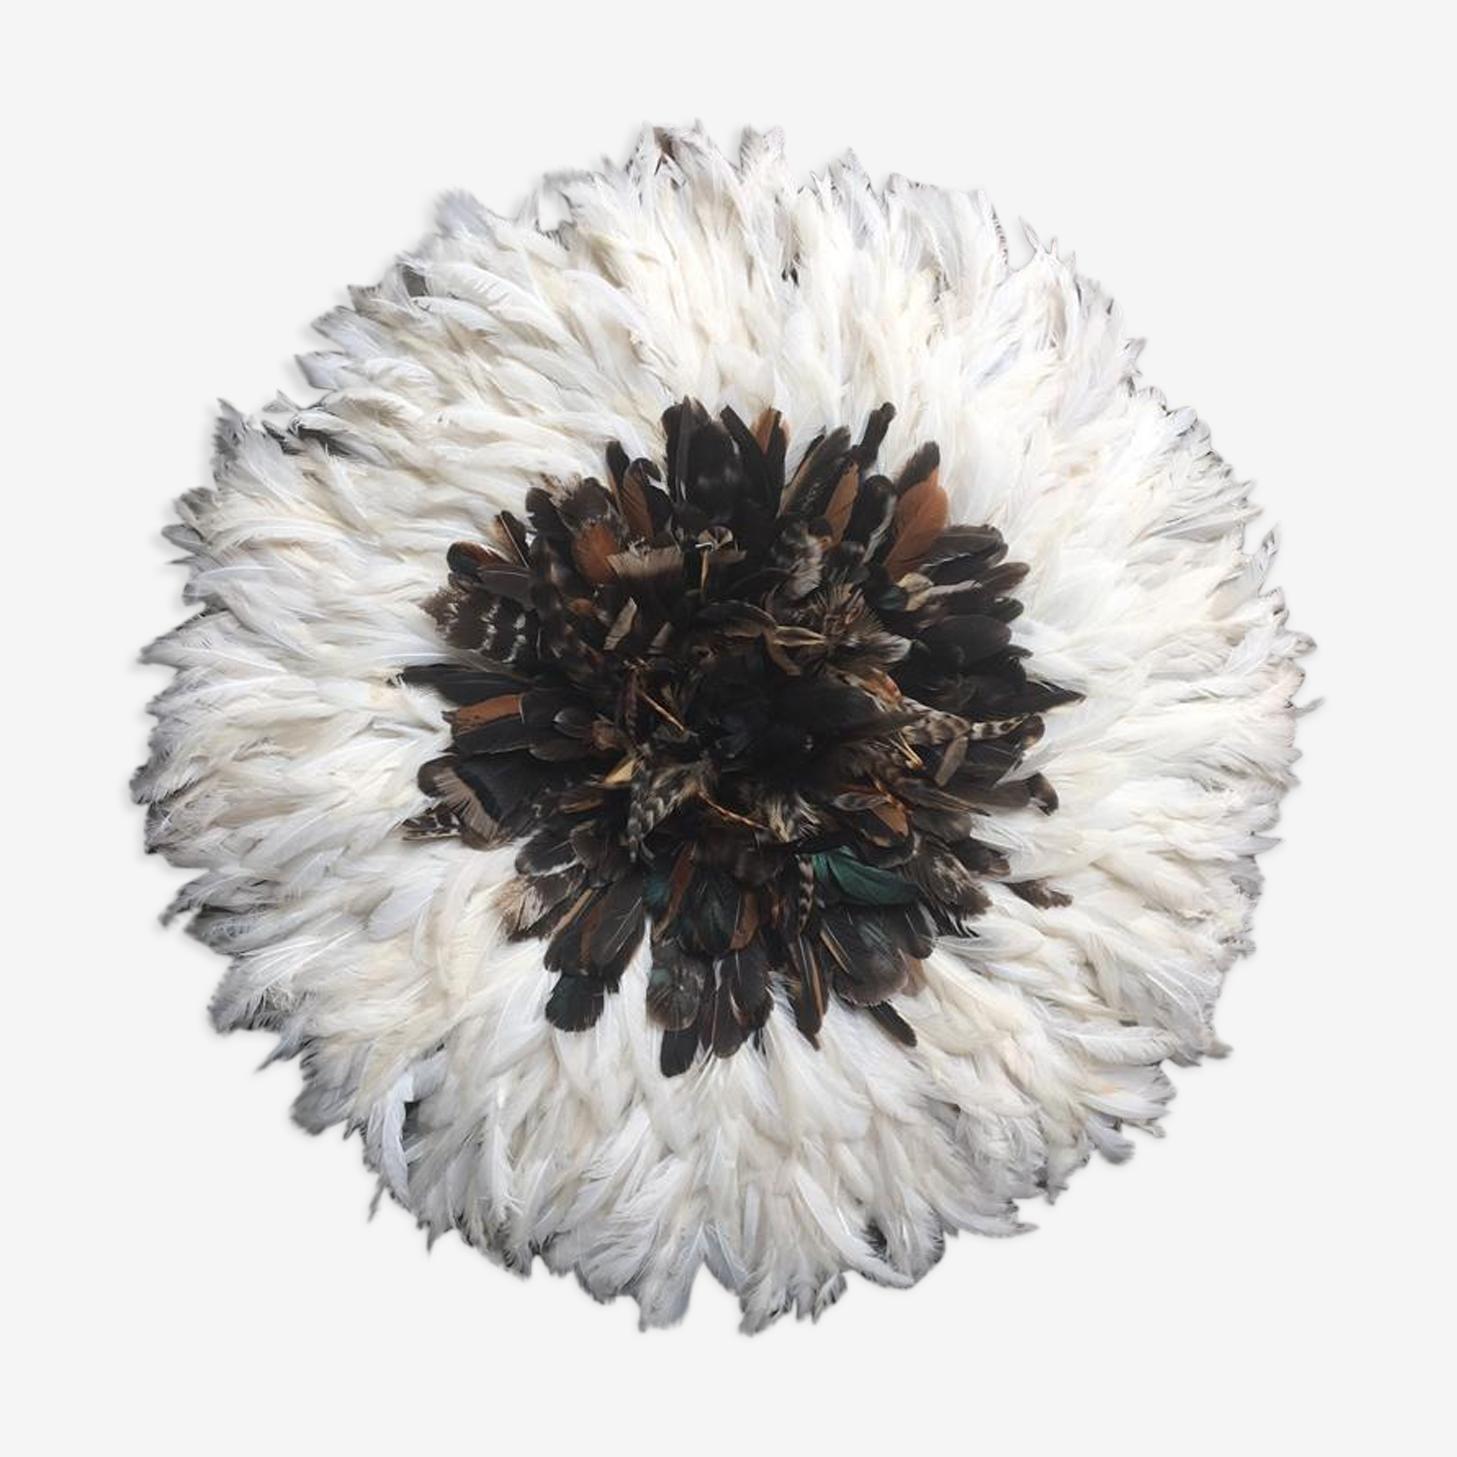 Juju hat inside natural contour white 50 cm